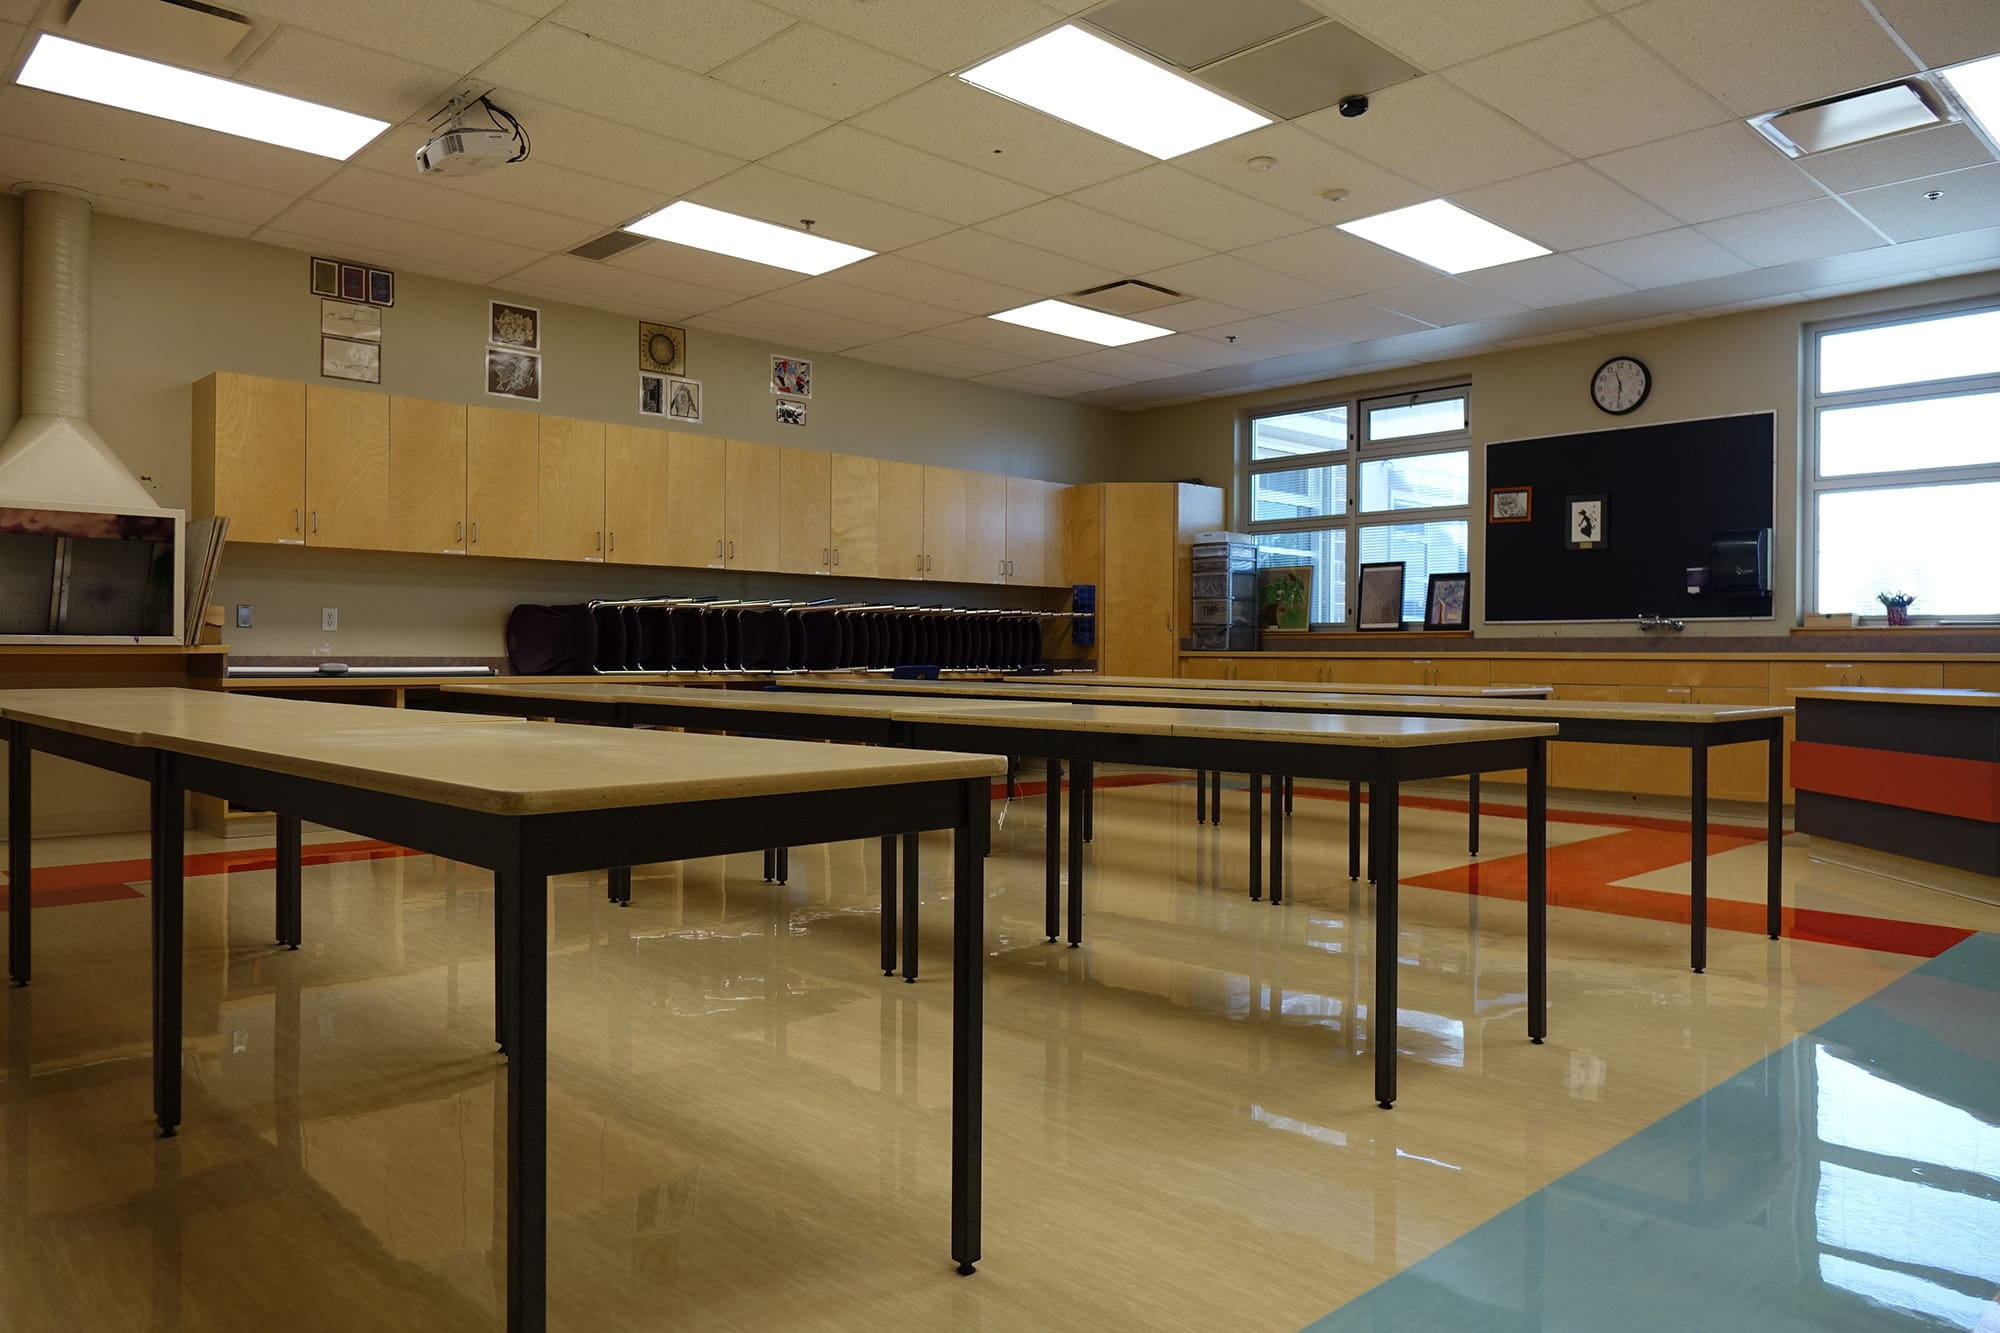 Derek Taylor Public School interior